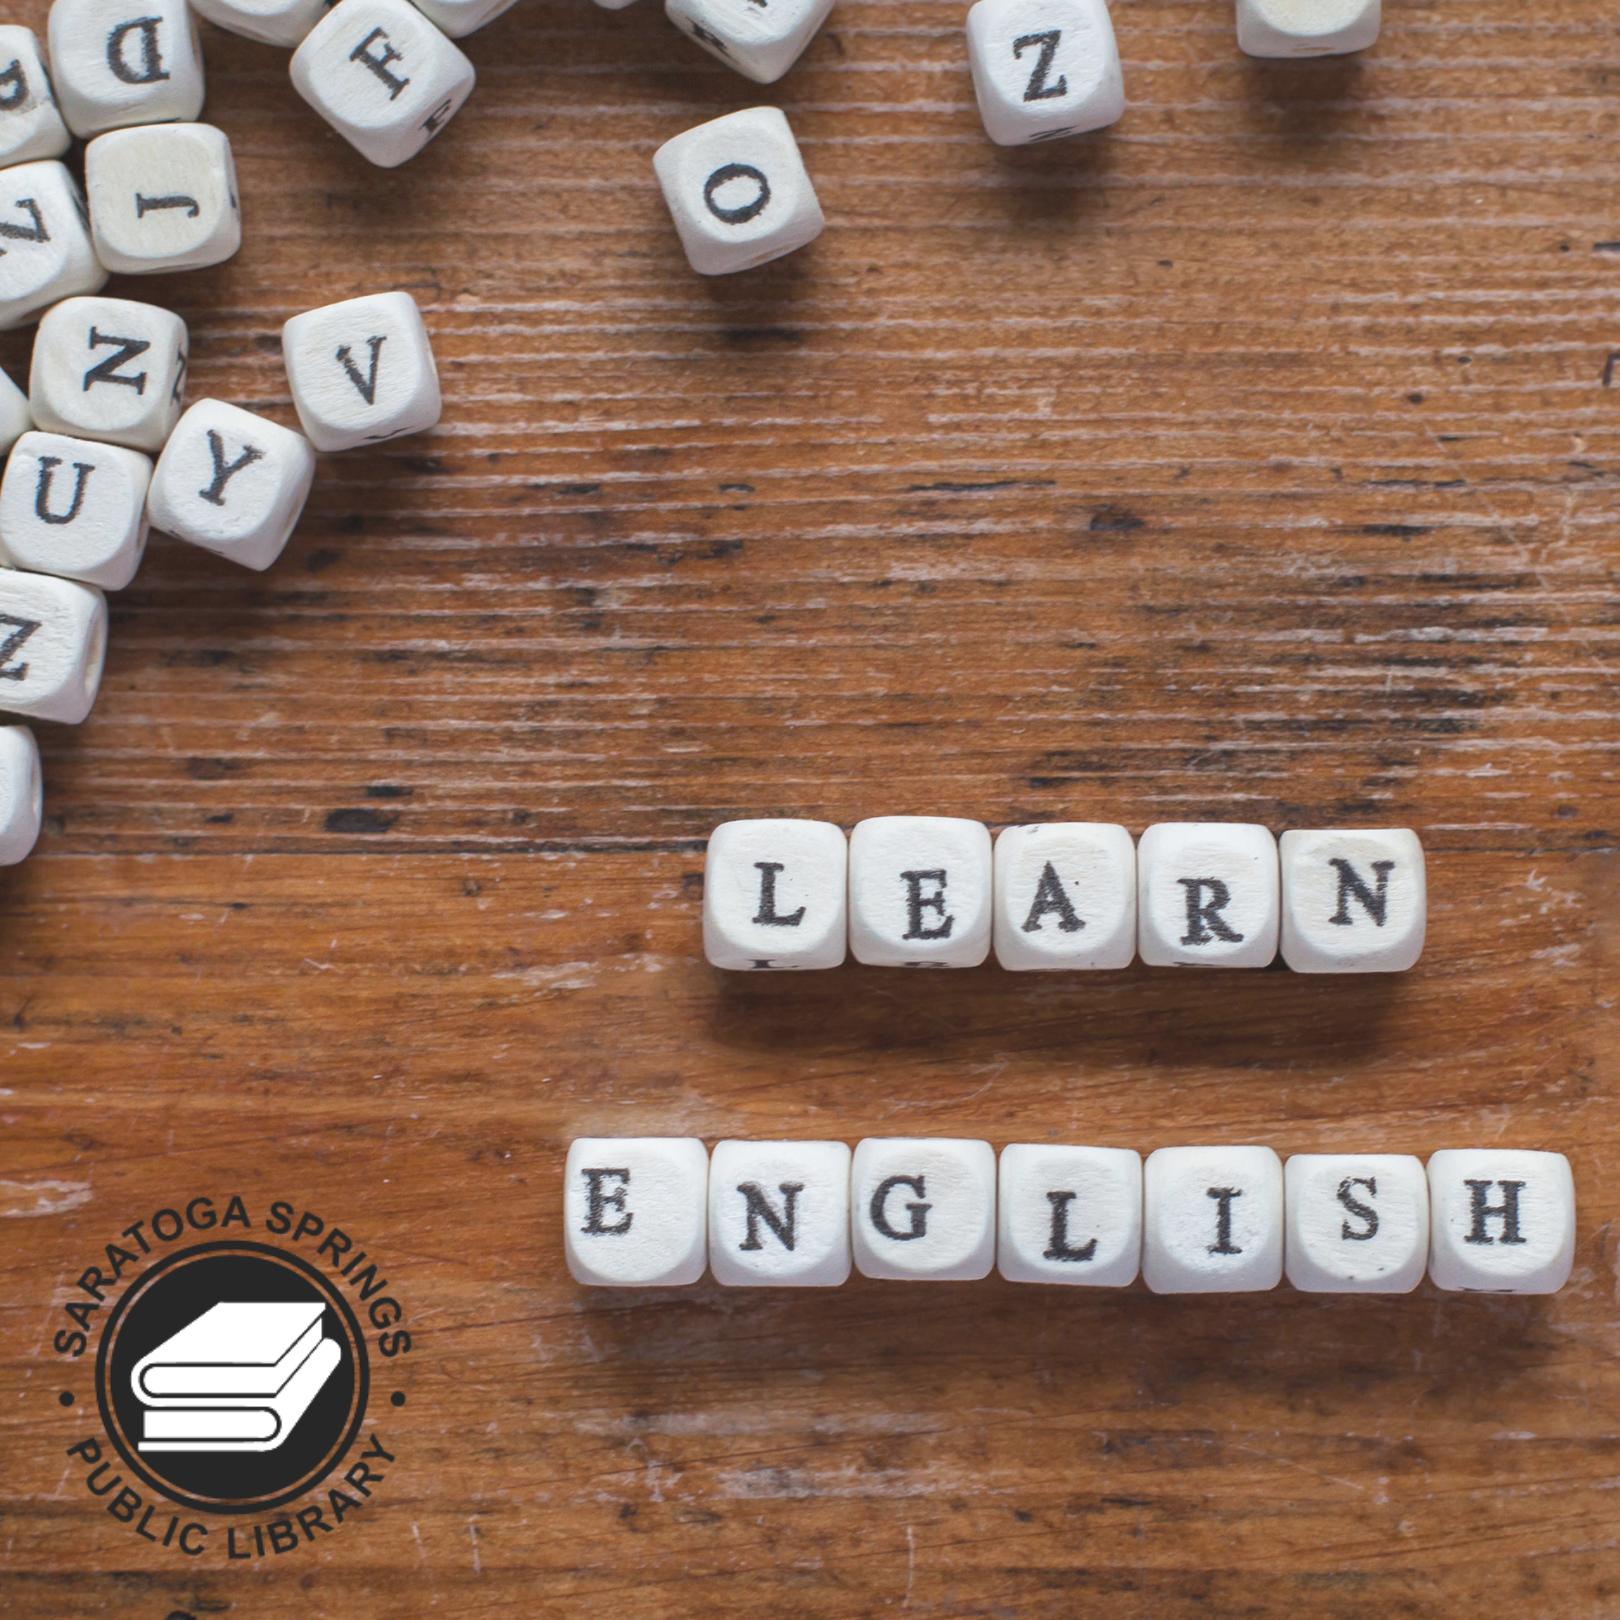 Beginning English Language Learning